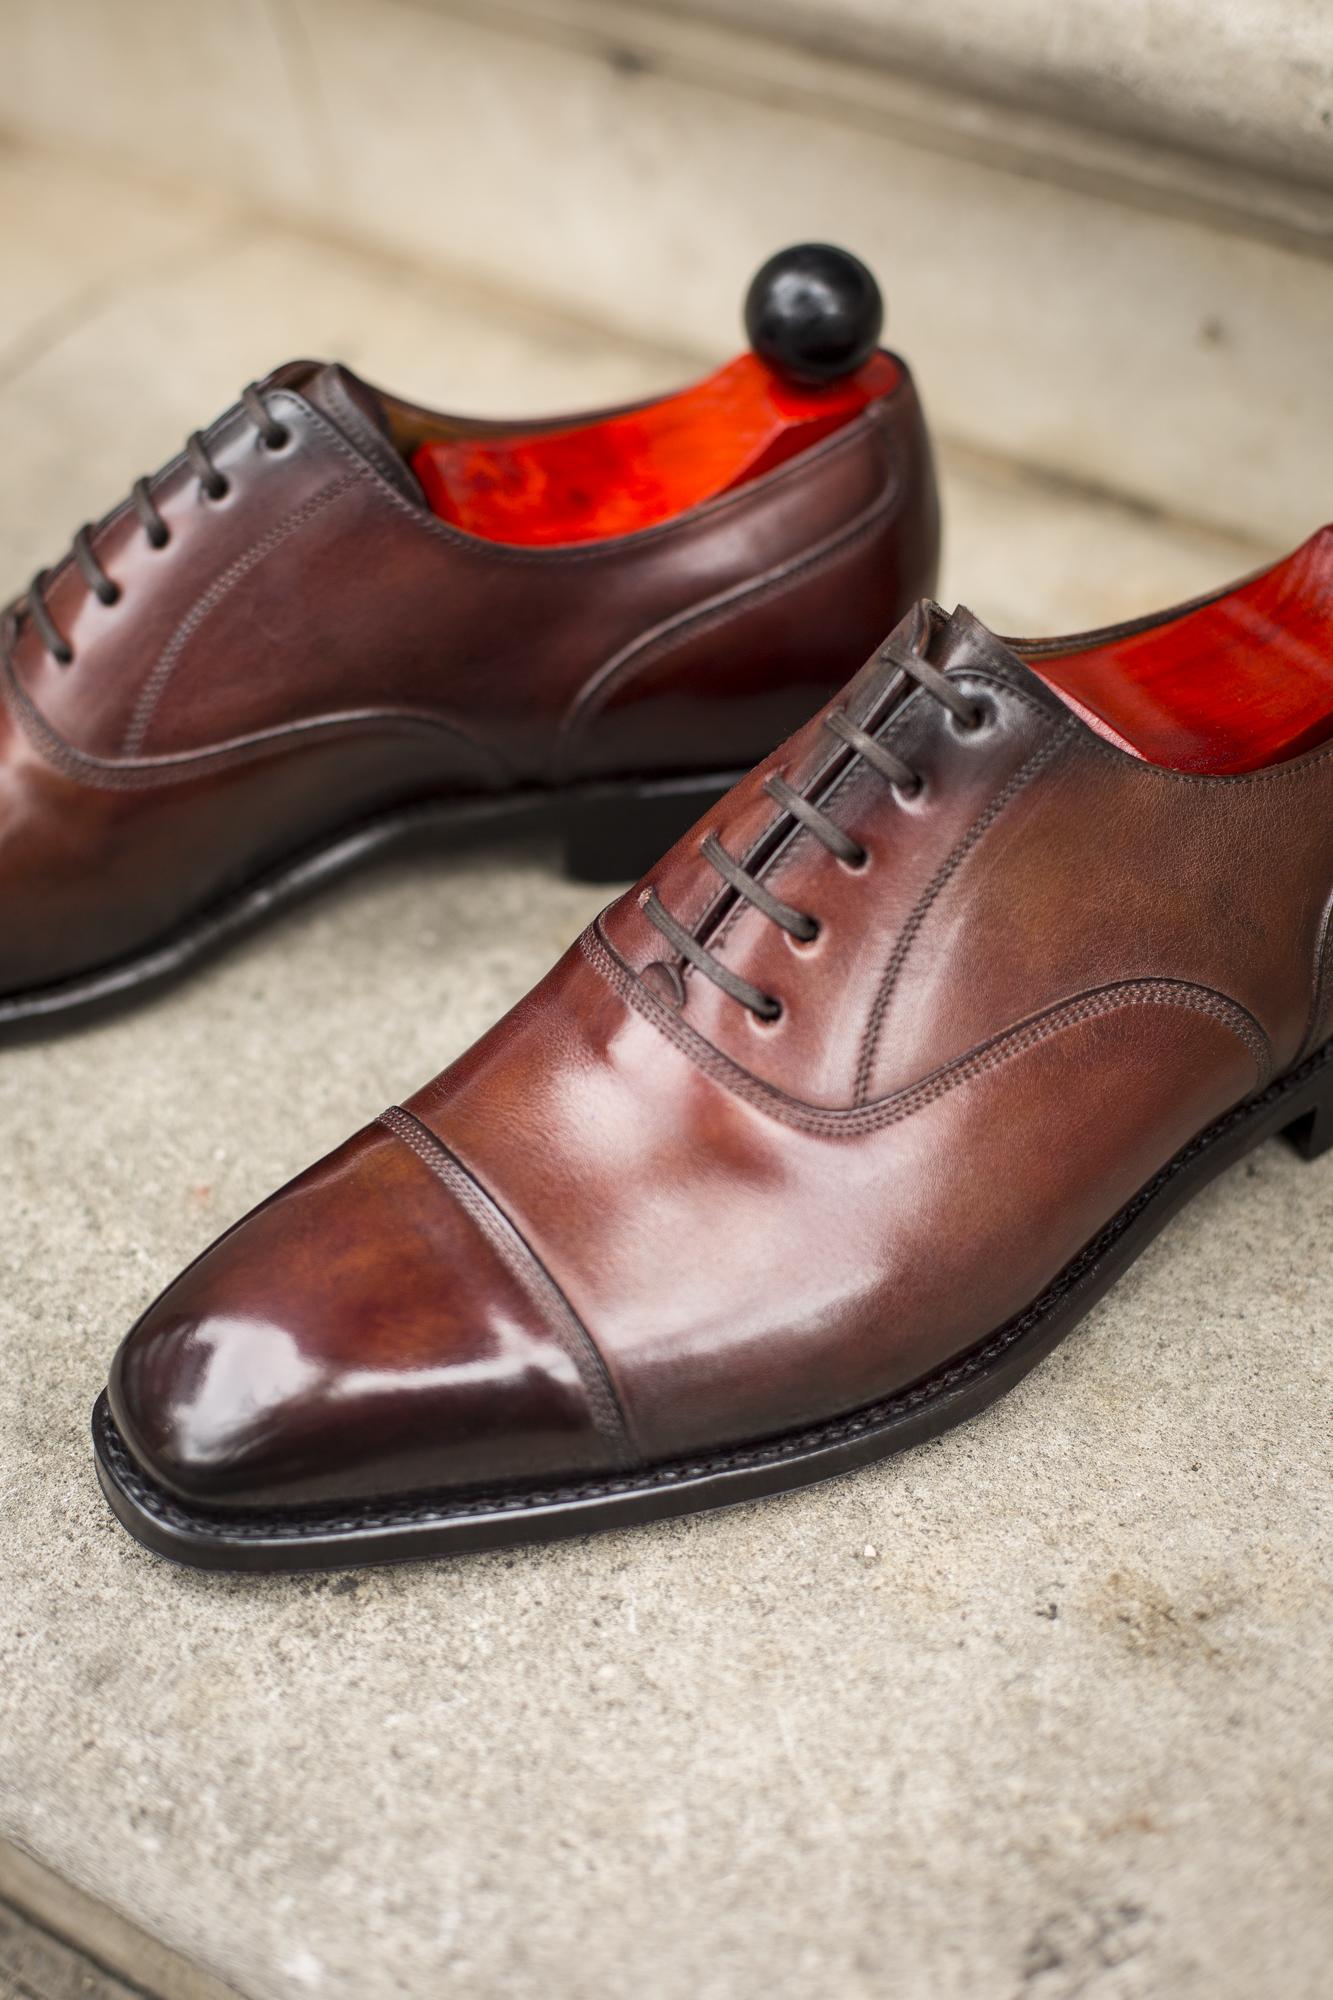 j-fitzpatrick-footwear-collection-5-may-2017-hero-0363.jpg